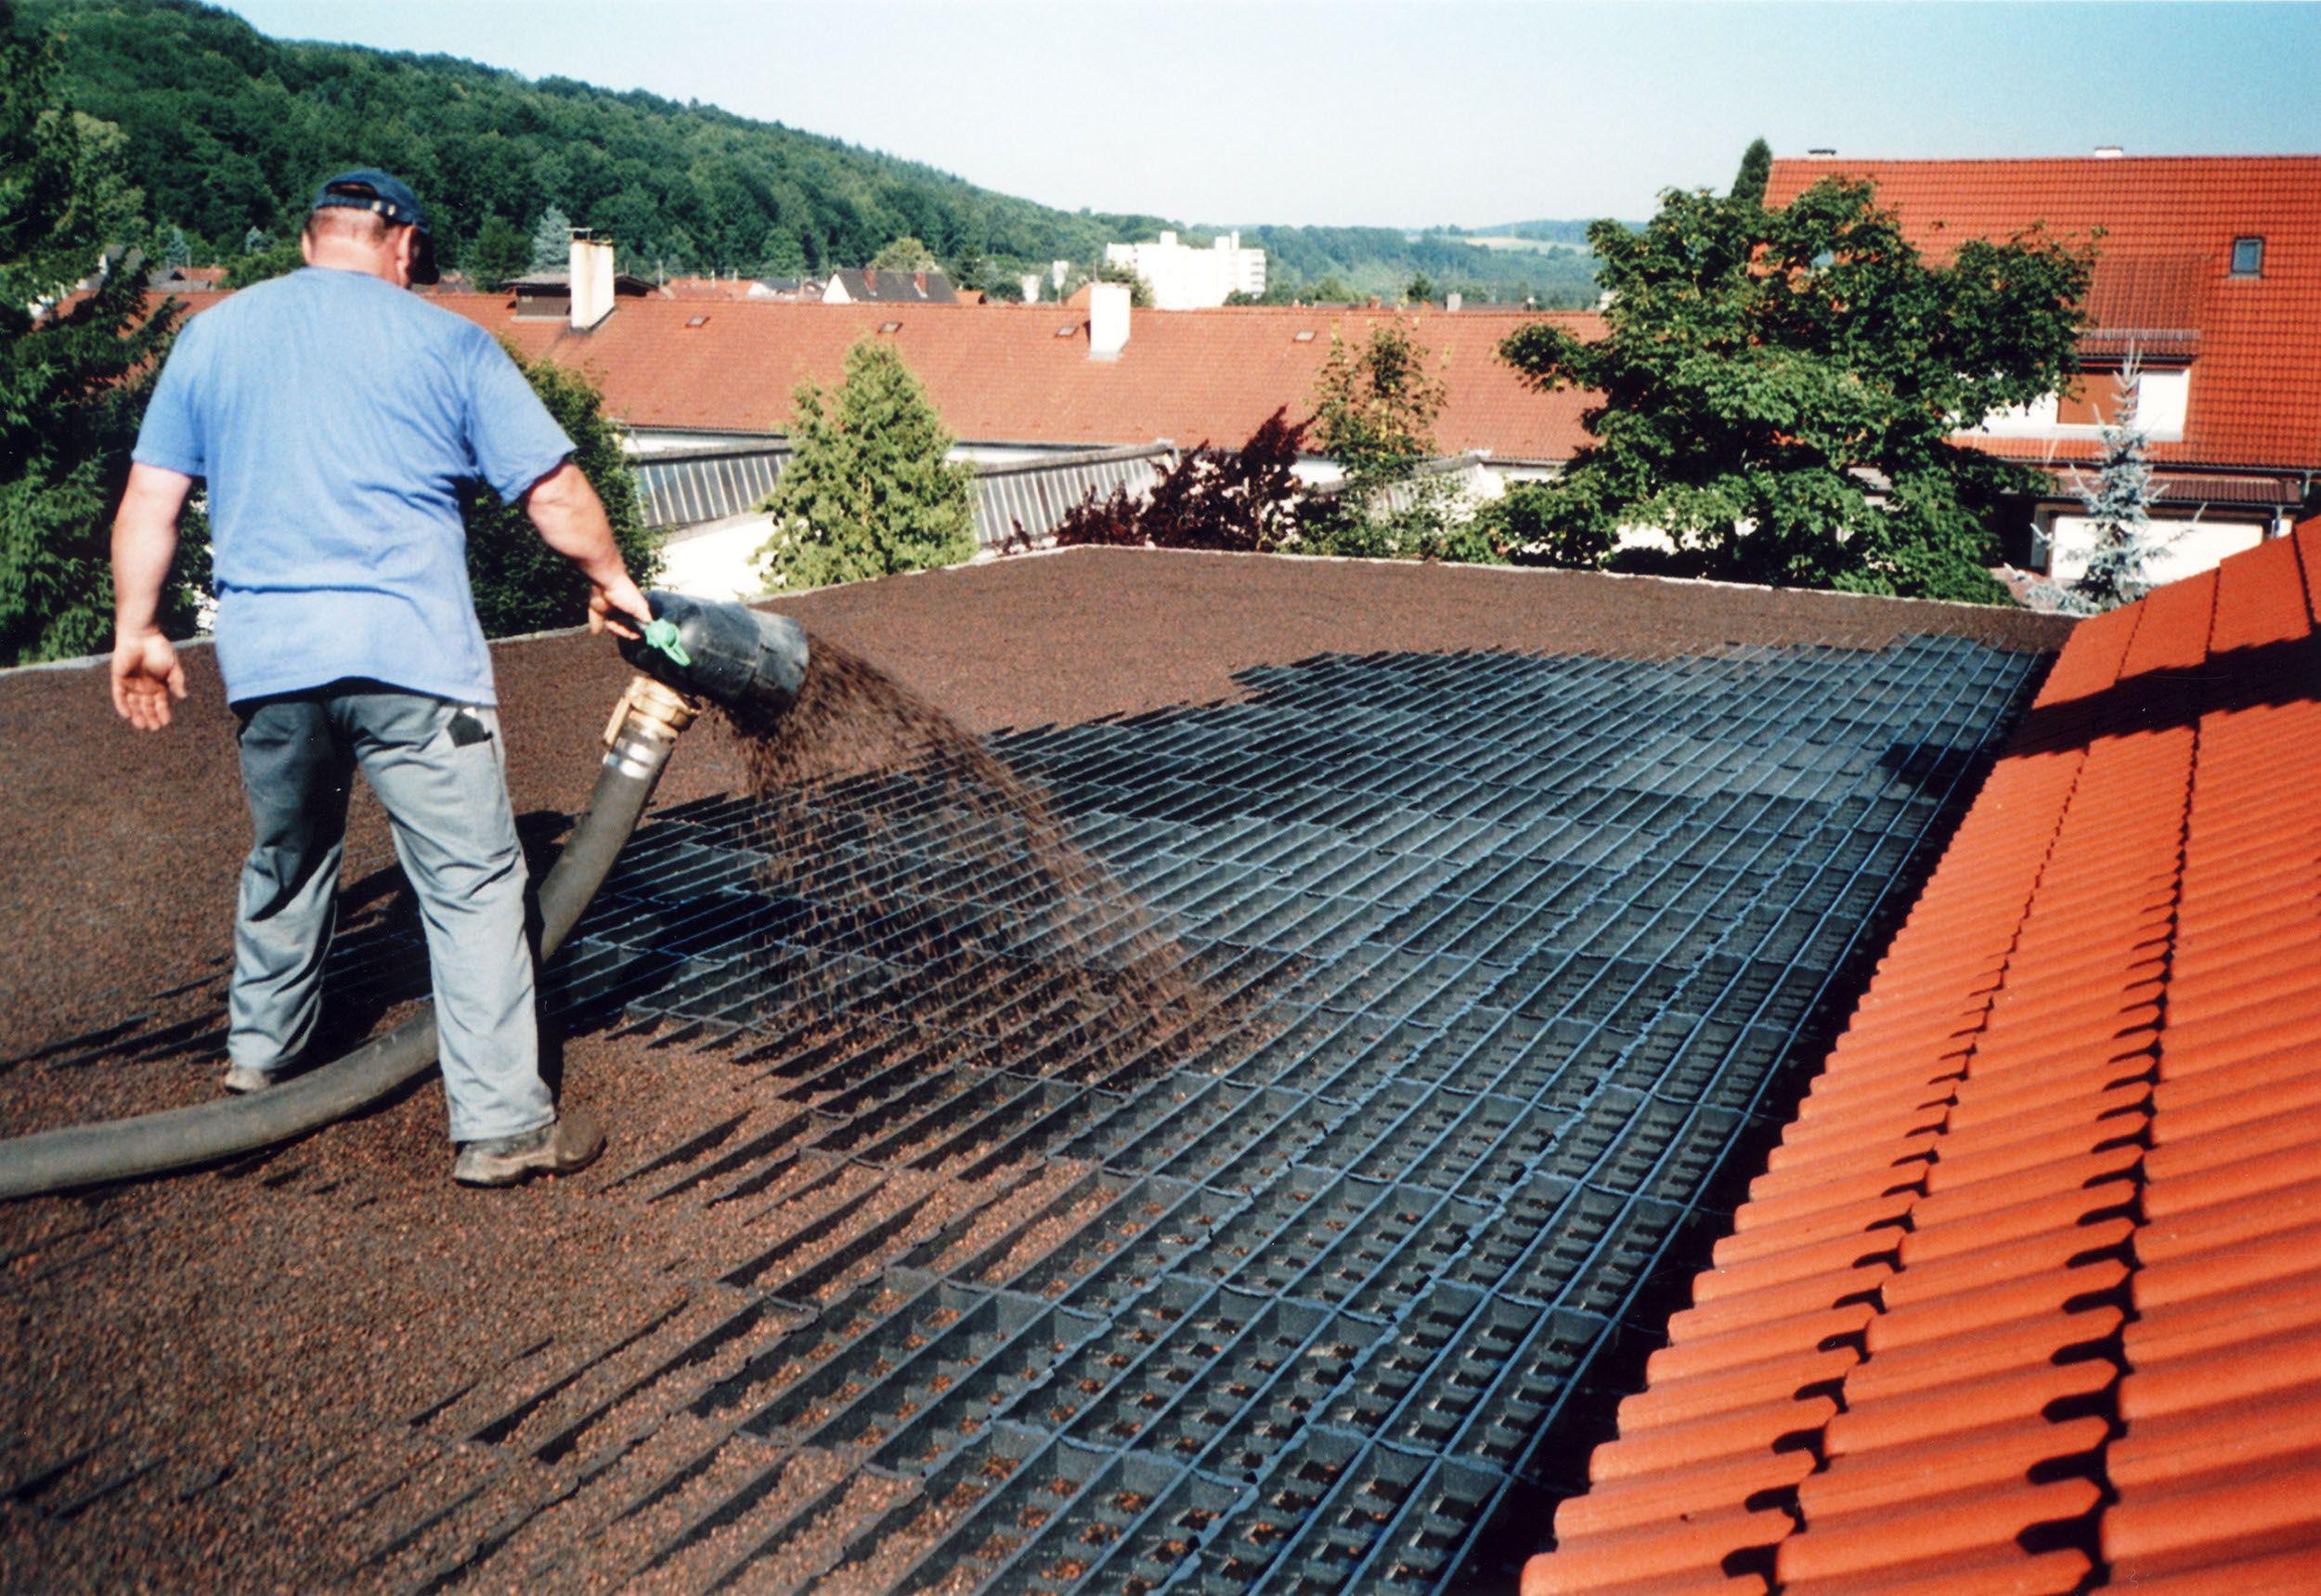 Core Roof Green Roof Installation Green Roof Garden Buildings